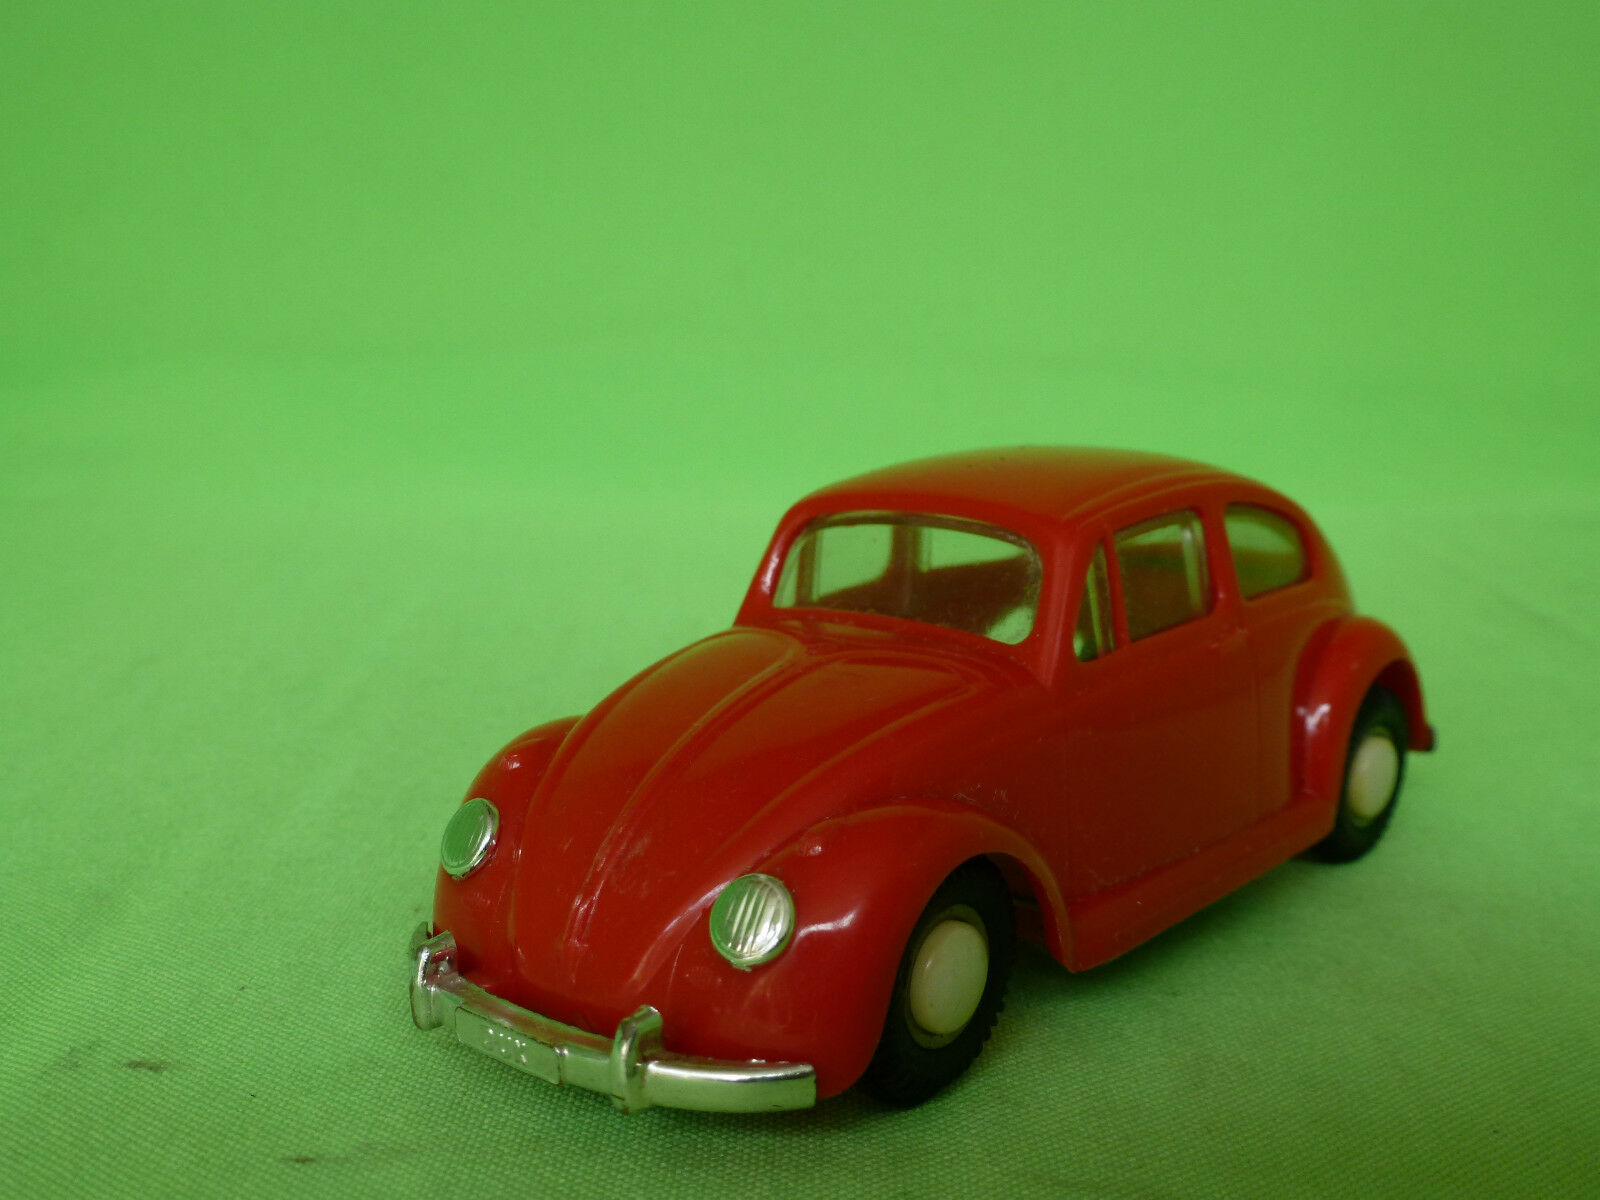 DUX  VW VOLKSWAGEN   PLASTIC    RARE SELTEN IN VERY GOOD CONDITION